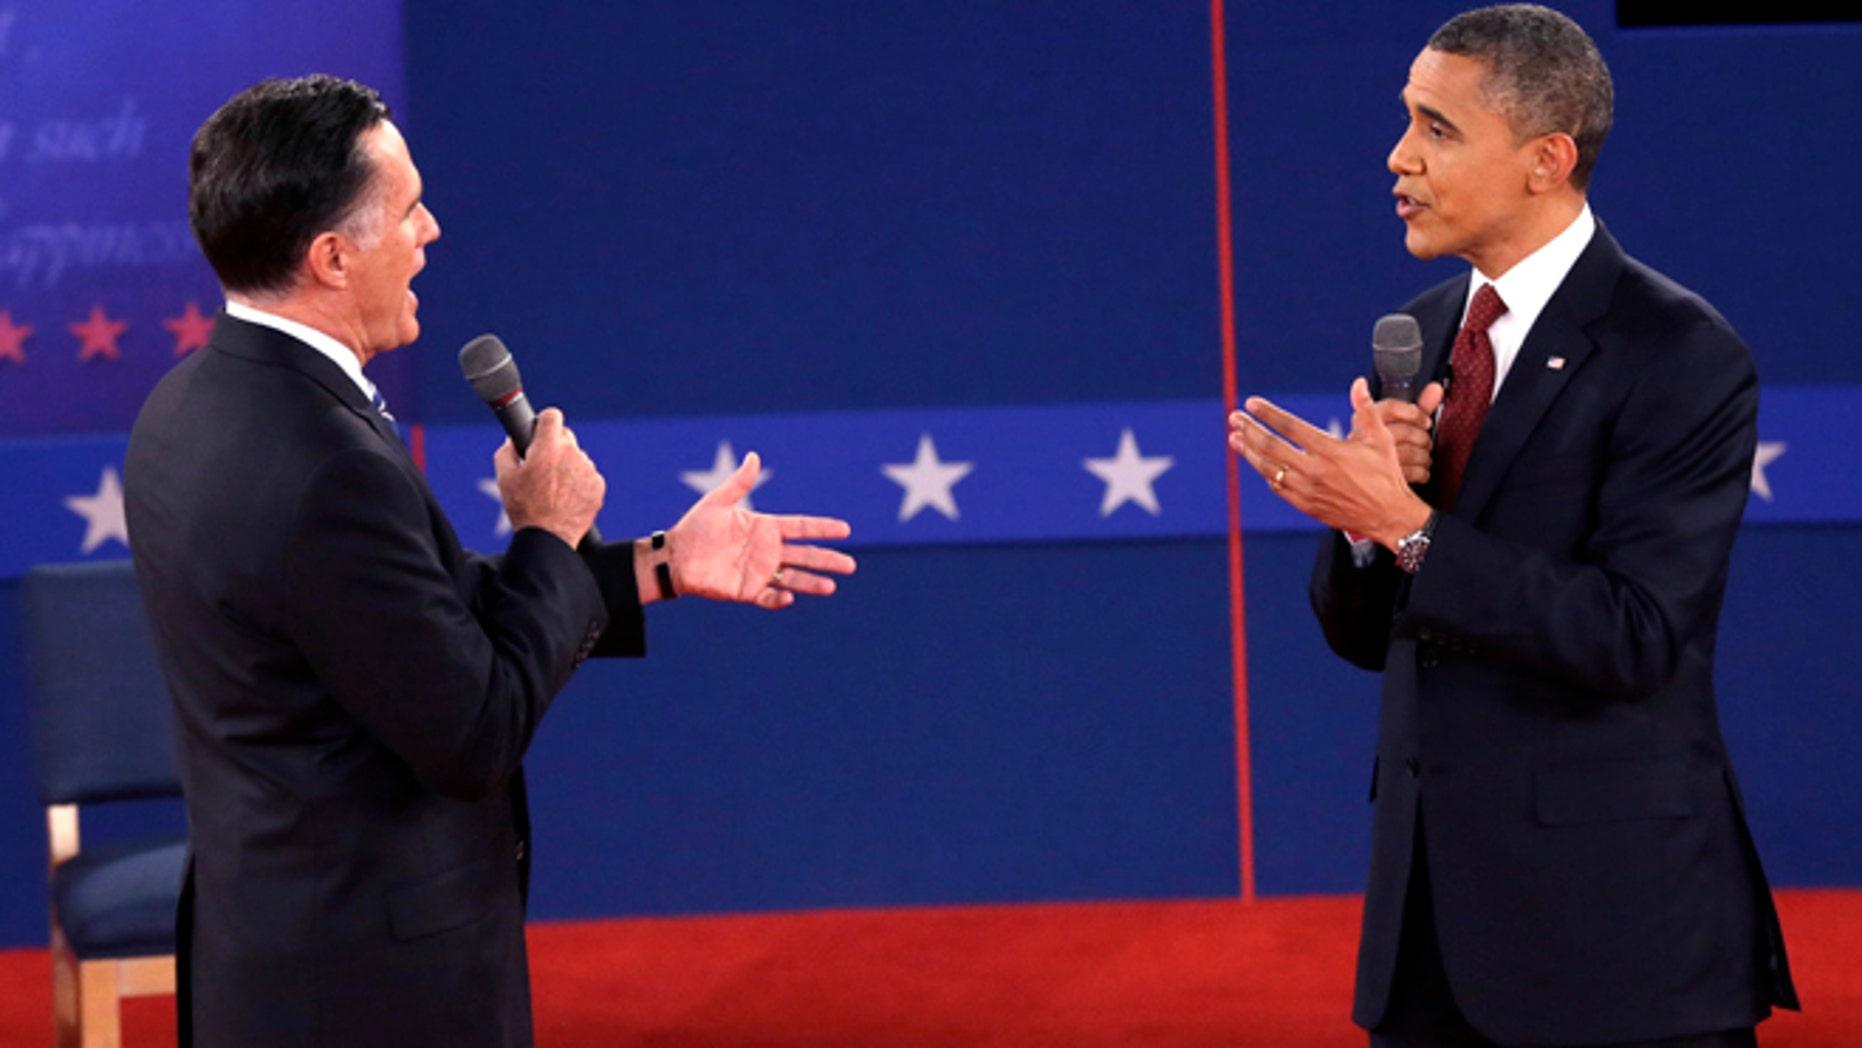 Oct. 16, 2012: Republican presidential nominee Mitt Romney and President Barack Obama speak during the second presidential debate.